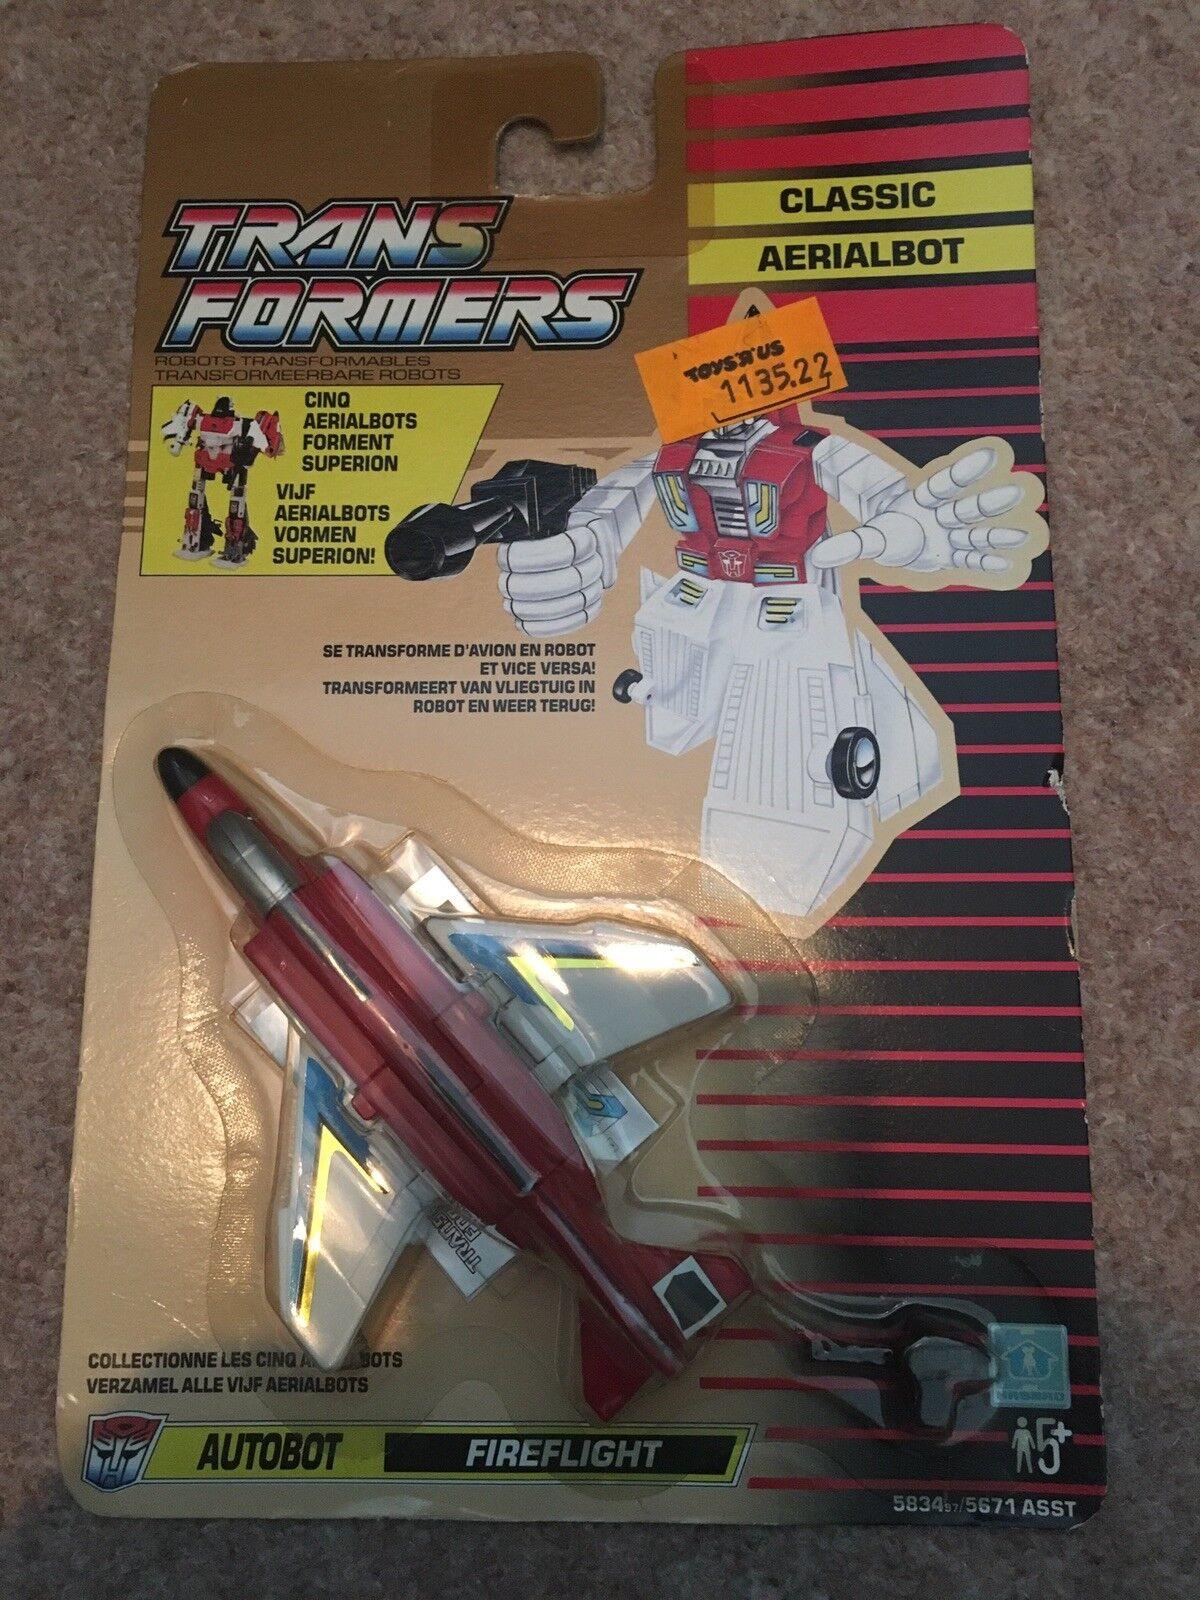 Transformers Classic Aerialbot Fireflight Retro Figure 1991 French Dutch autobot